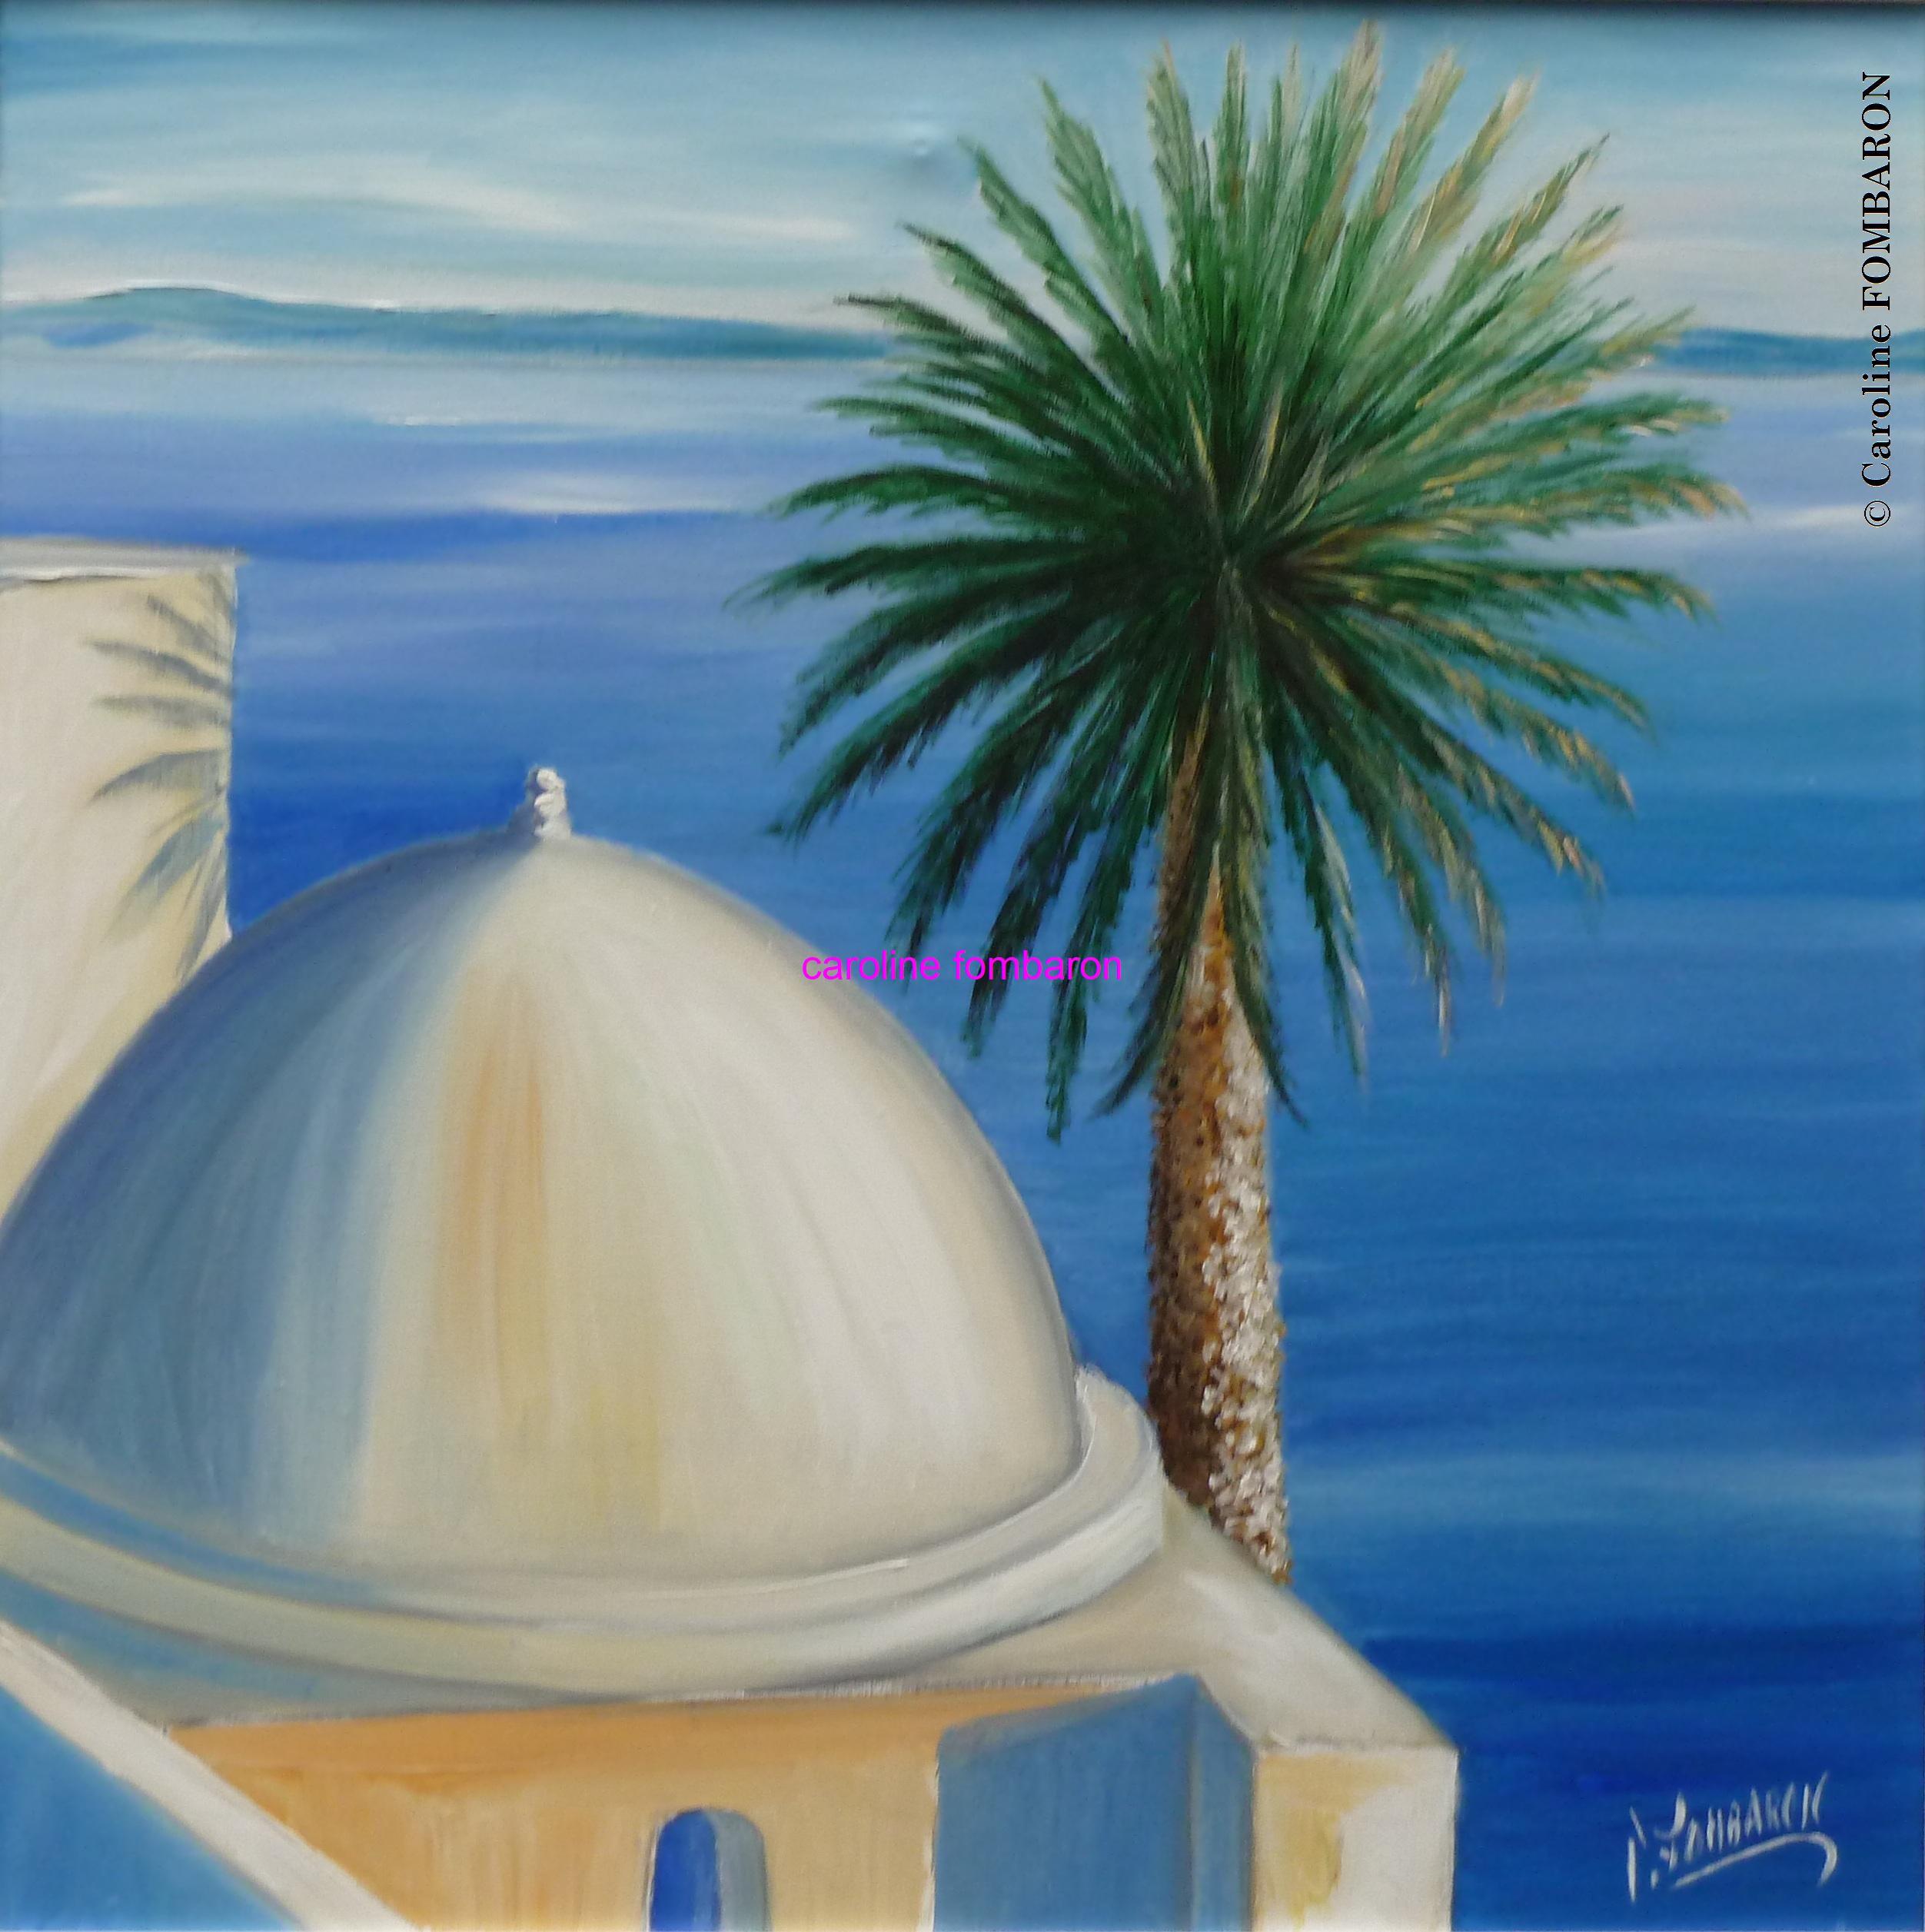 Le palmier bord de mer tunisie